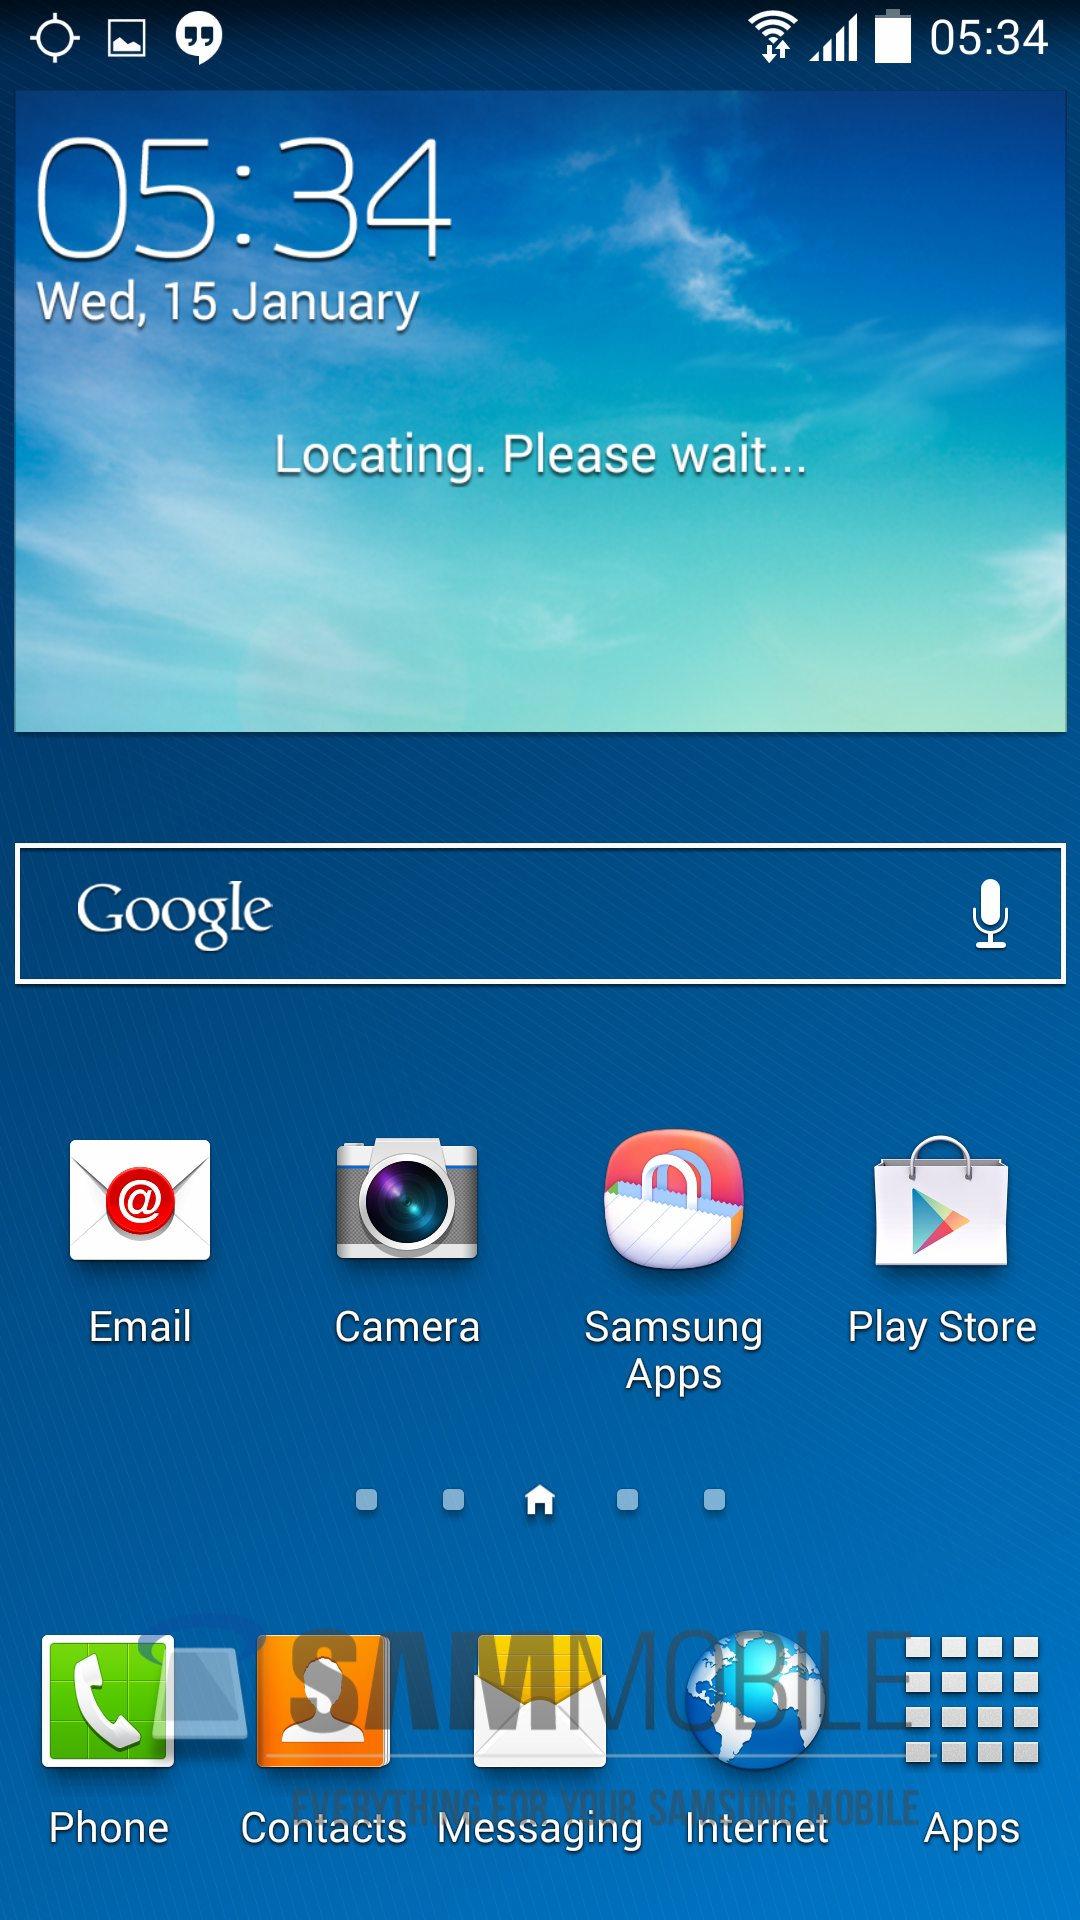 Android_KitKat_4.4.2_Galaxy_S4 (3)